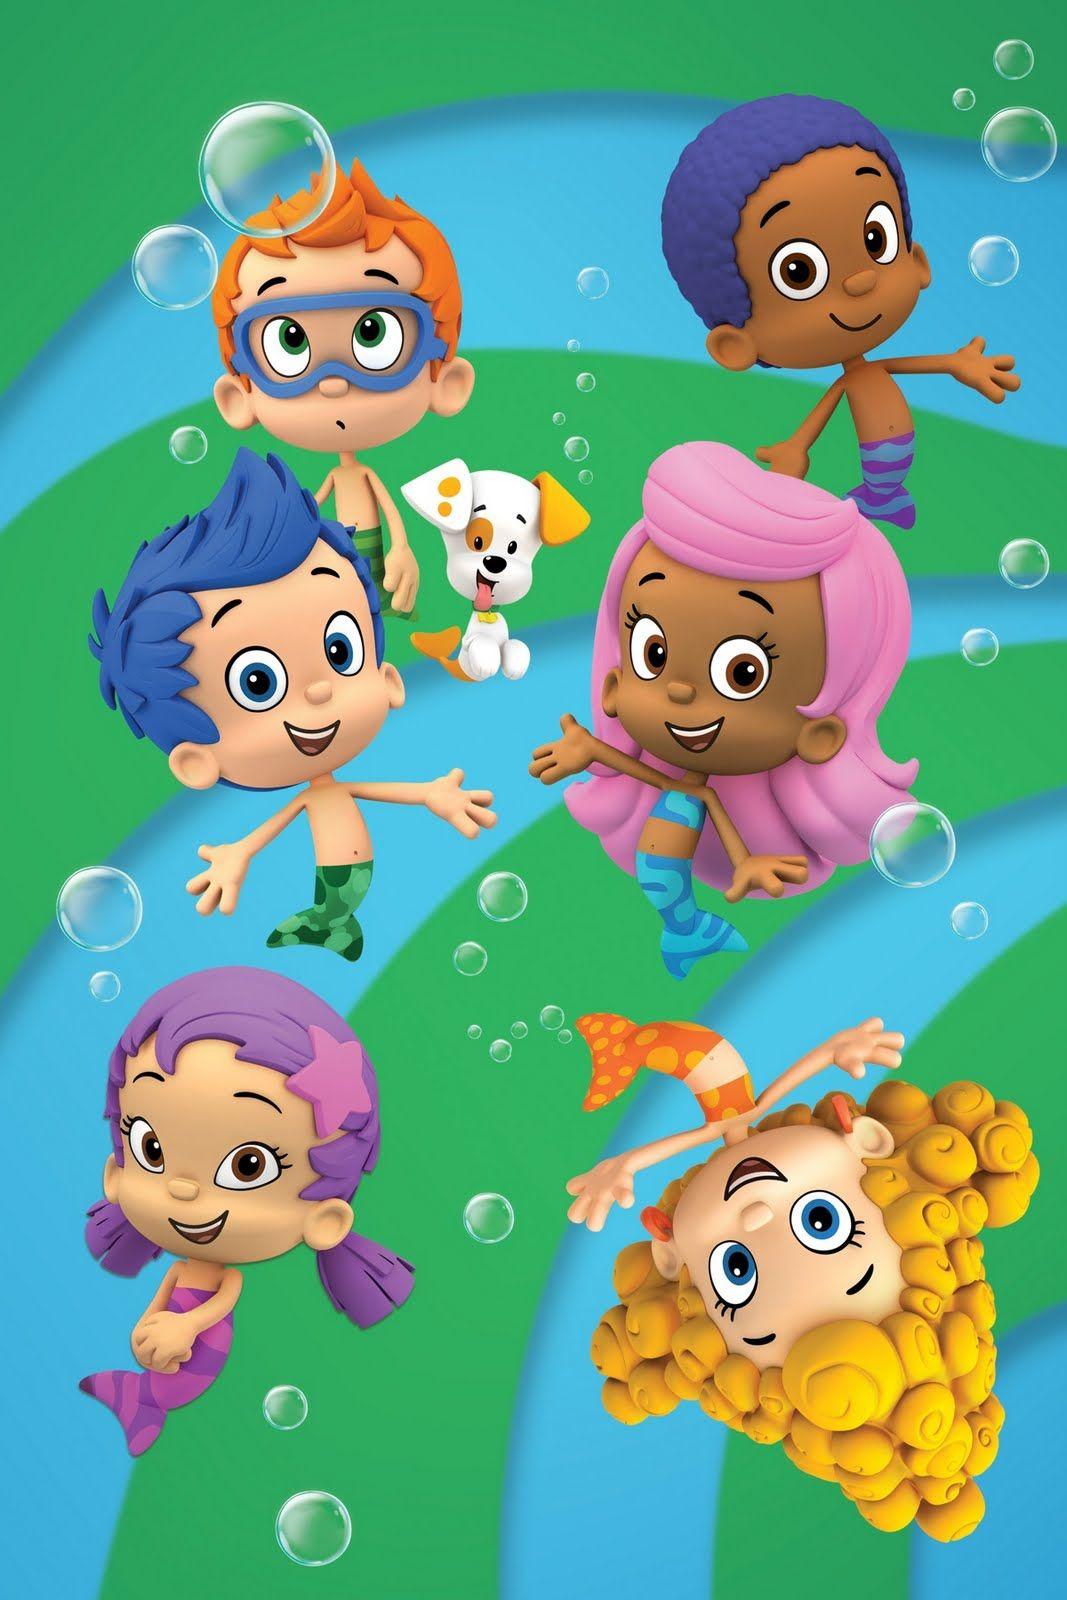 Bubble Guppies Dance : bubble, guppies, dance, Ballerina, Mermaids/mermen, Dancing, Bubbles, Looks, Website, Bubble, Guppies, Party,, Birthday